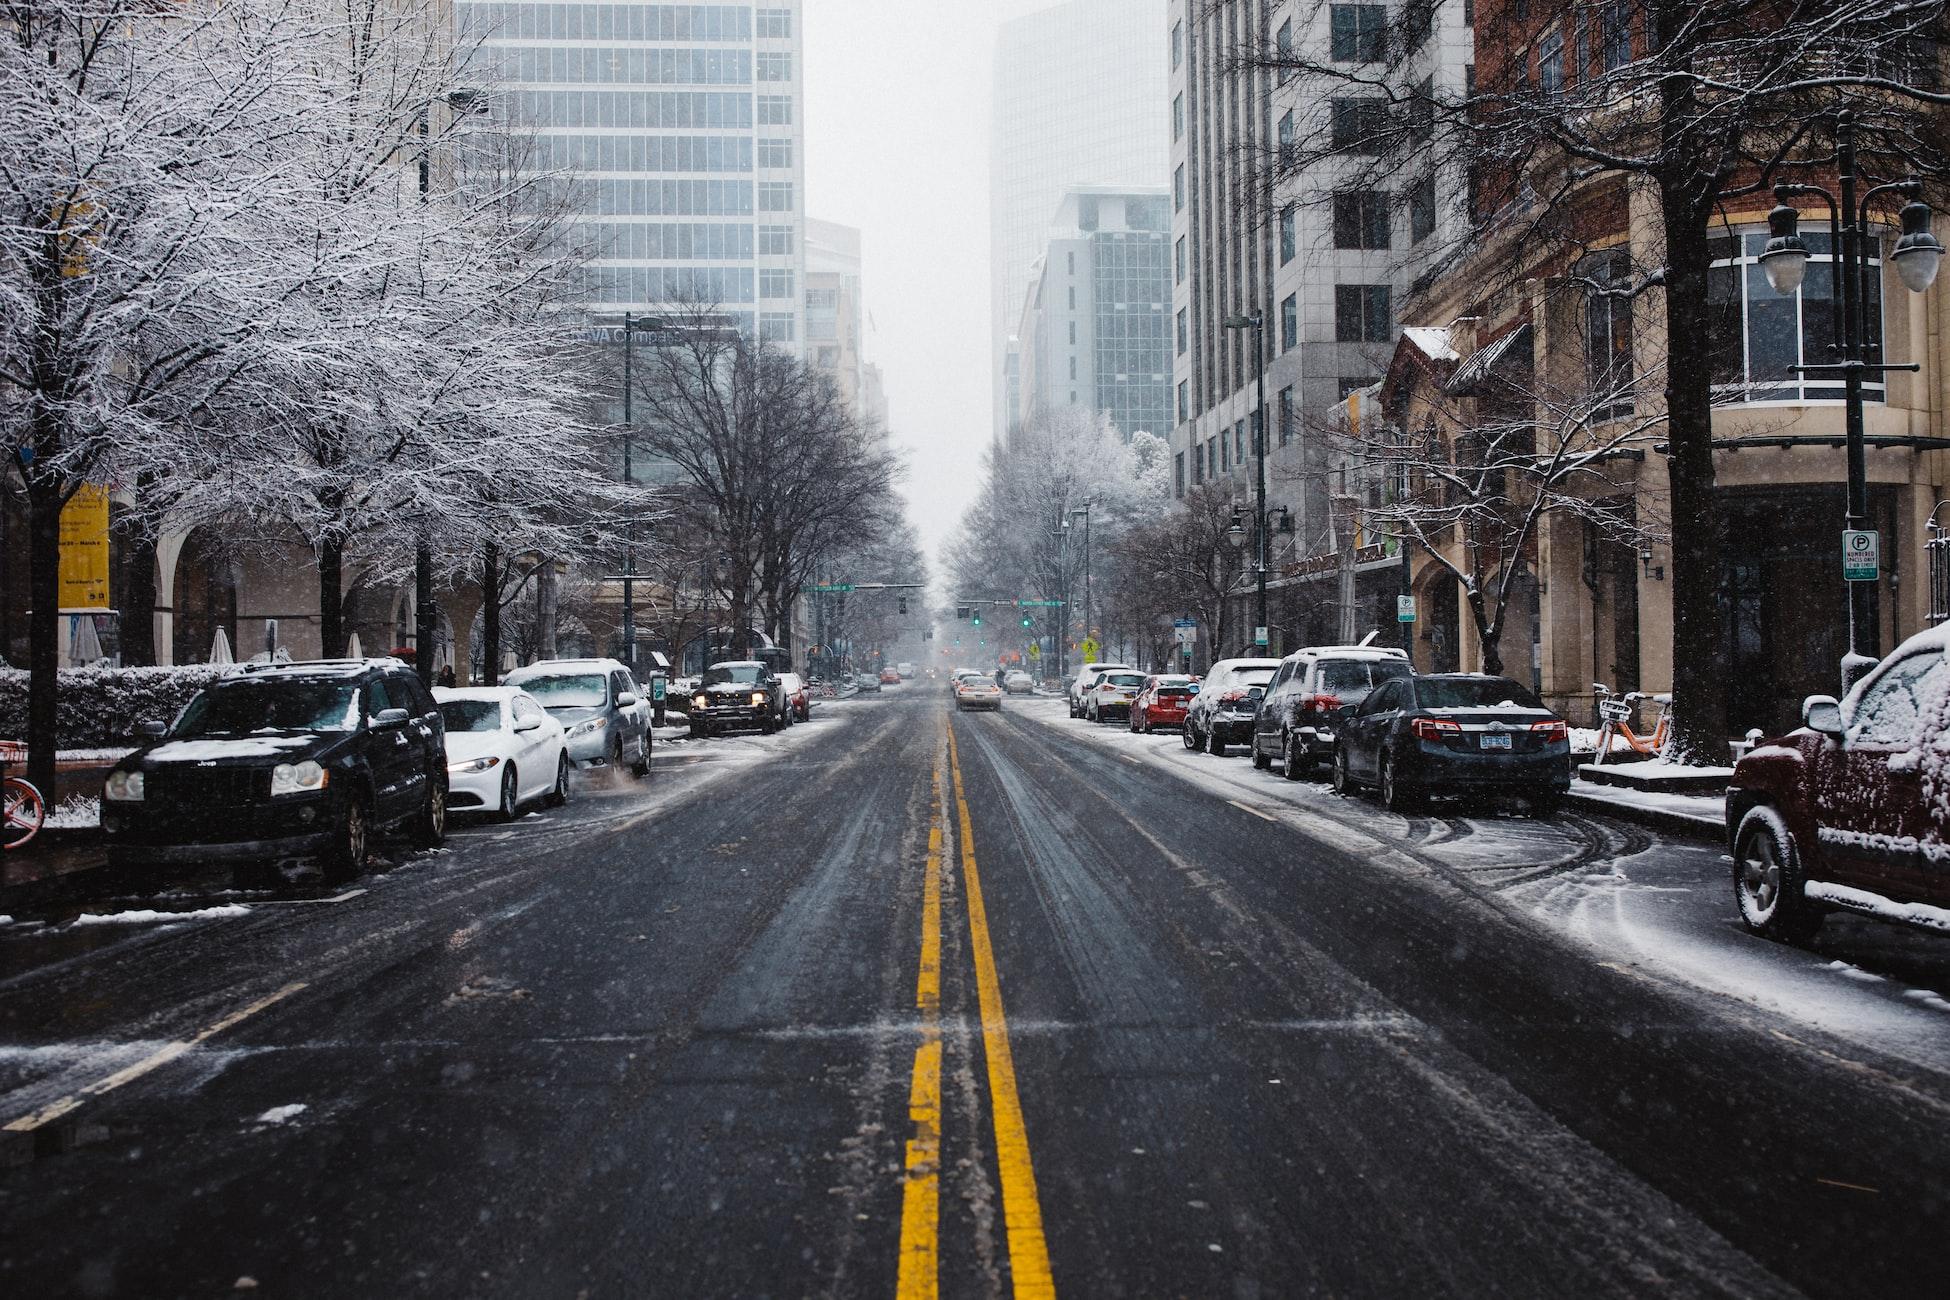 snowy street in Charlotte, NC